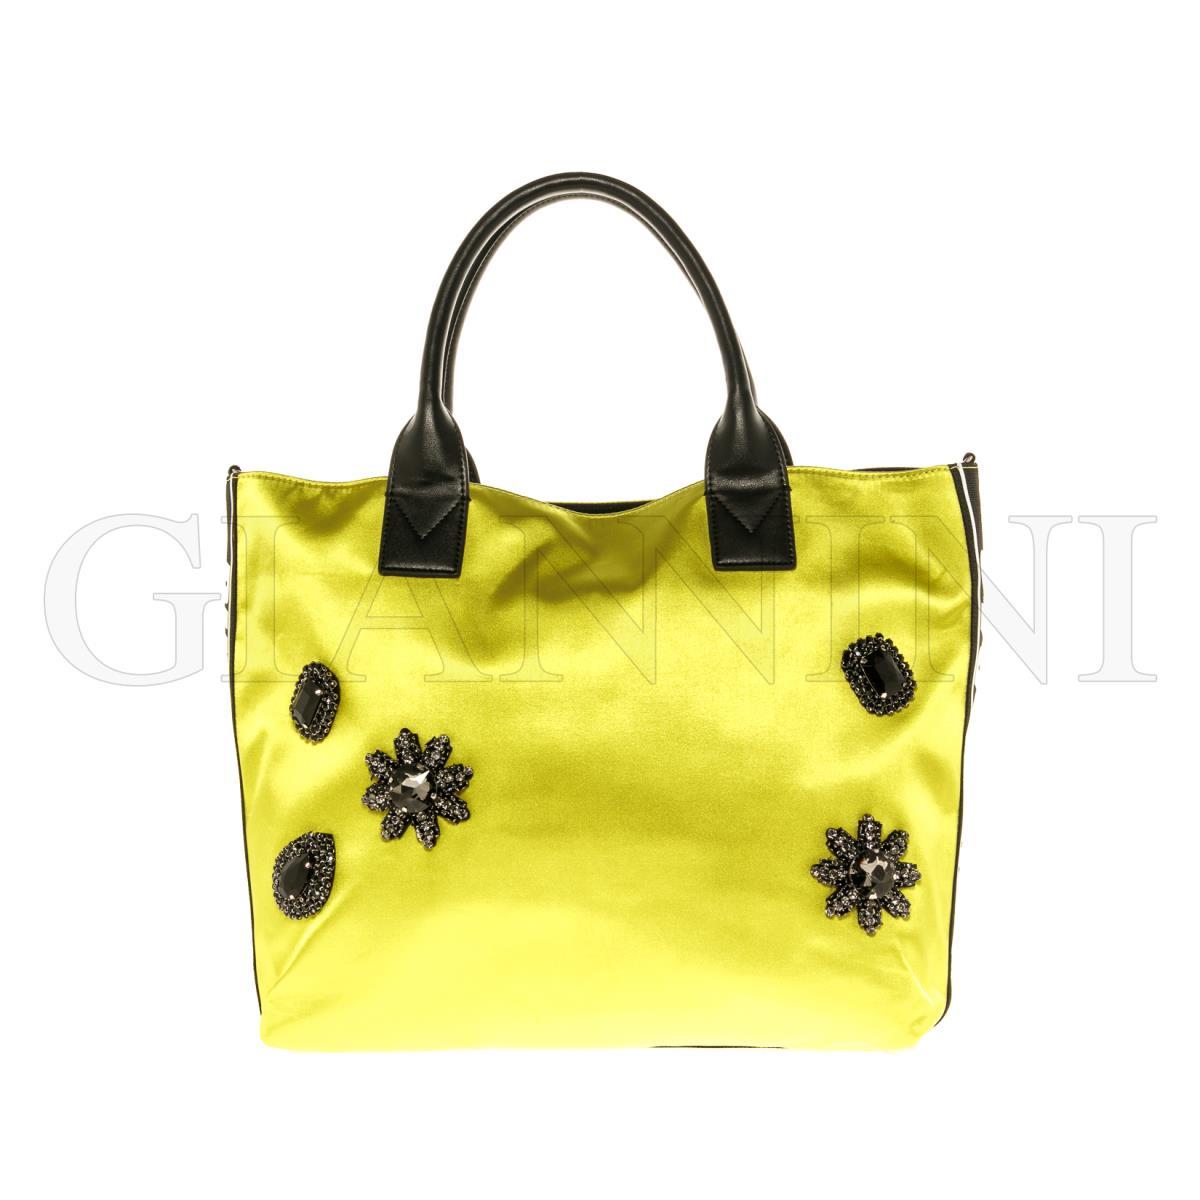 690ef84b6fa08 PINKO Shopping bag CAPPONE for Women